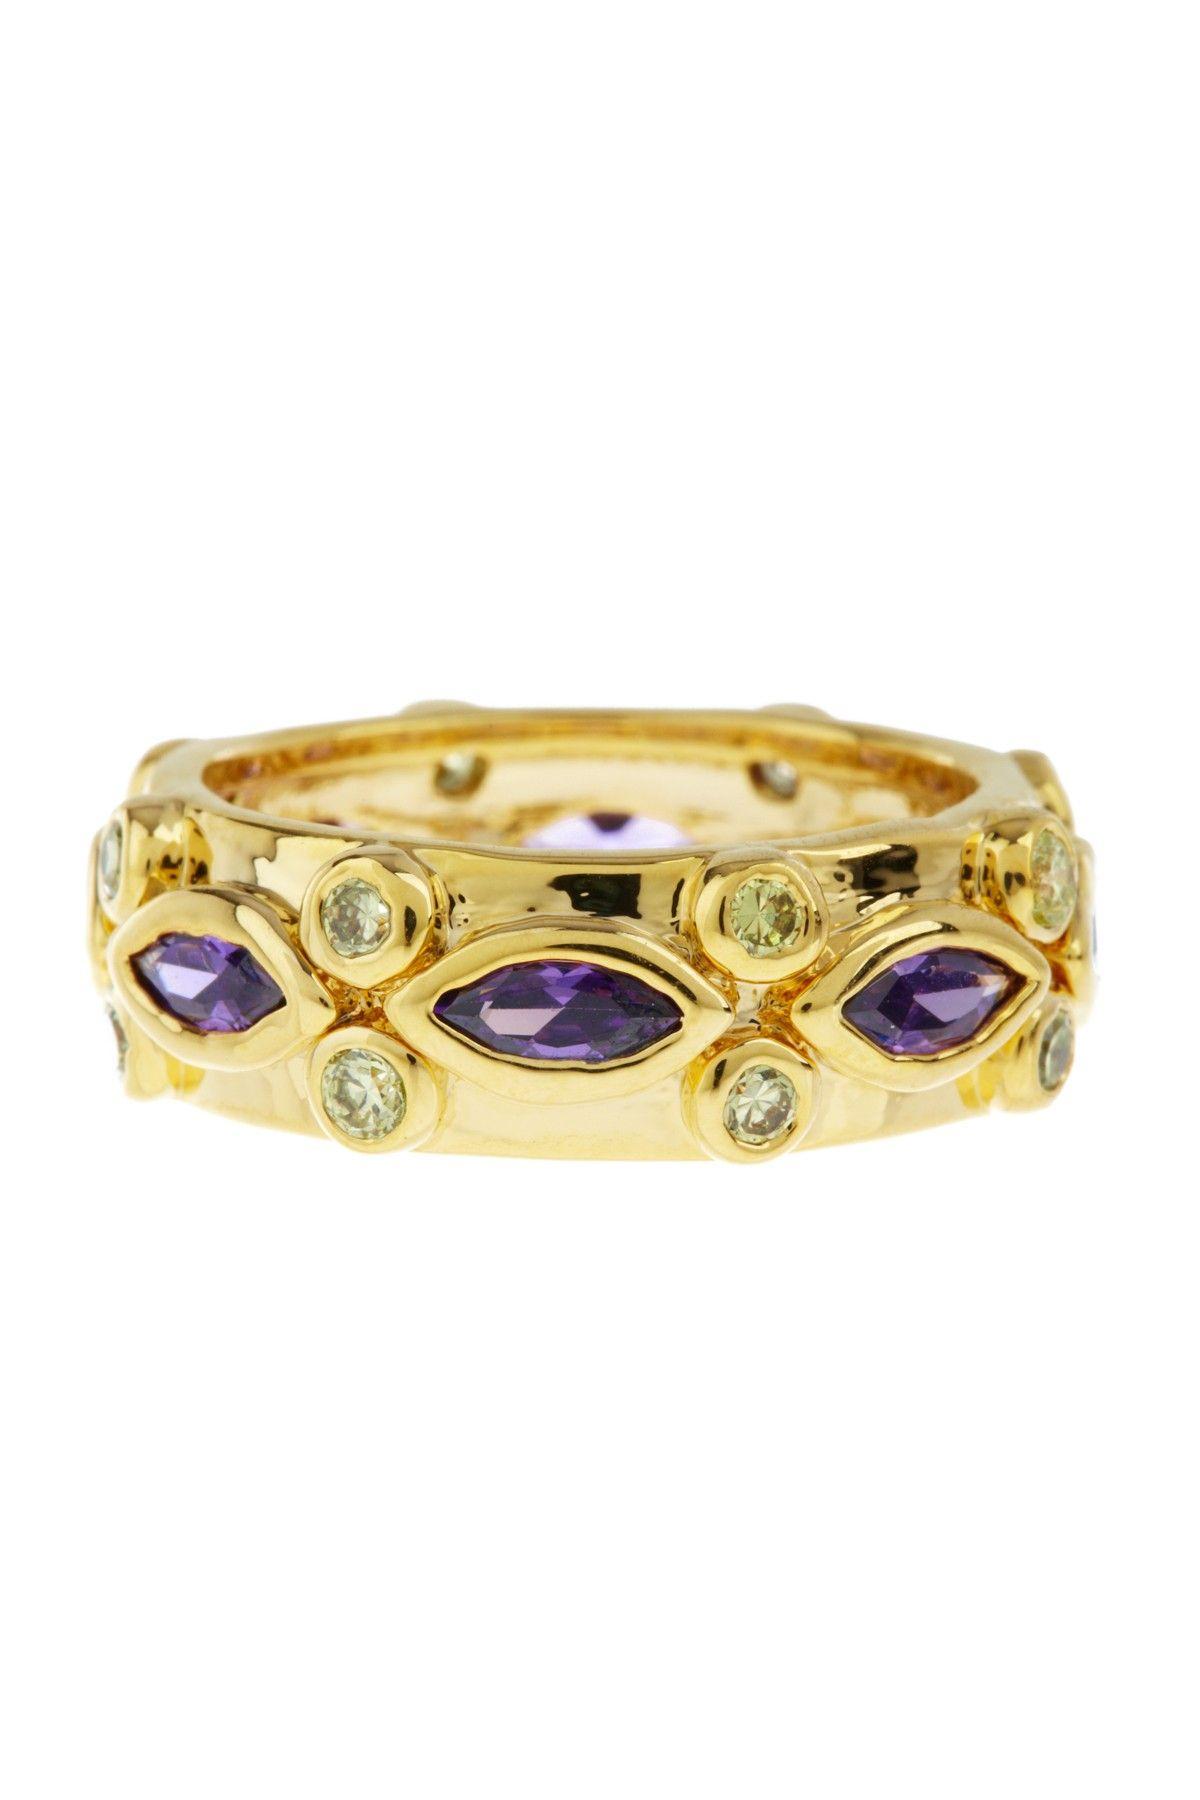 11+ Scottish wedding rings glasgow information